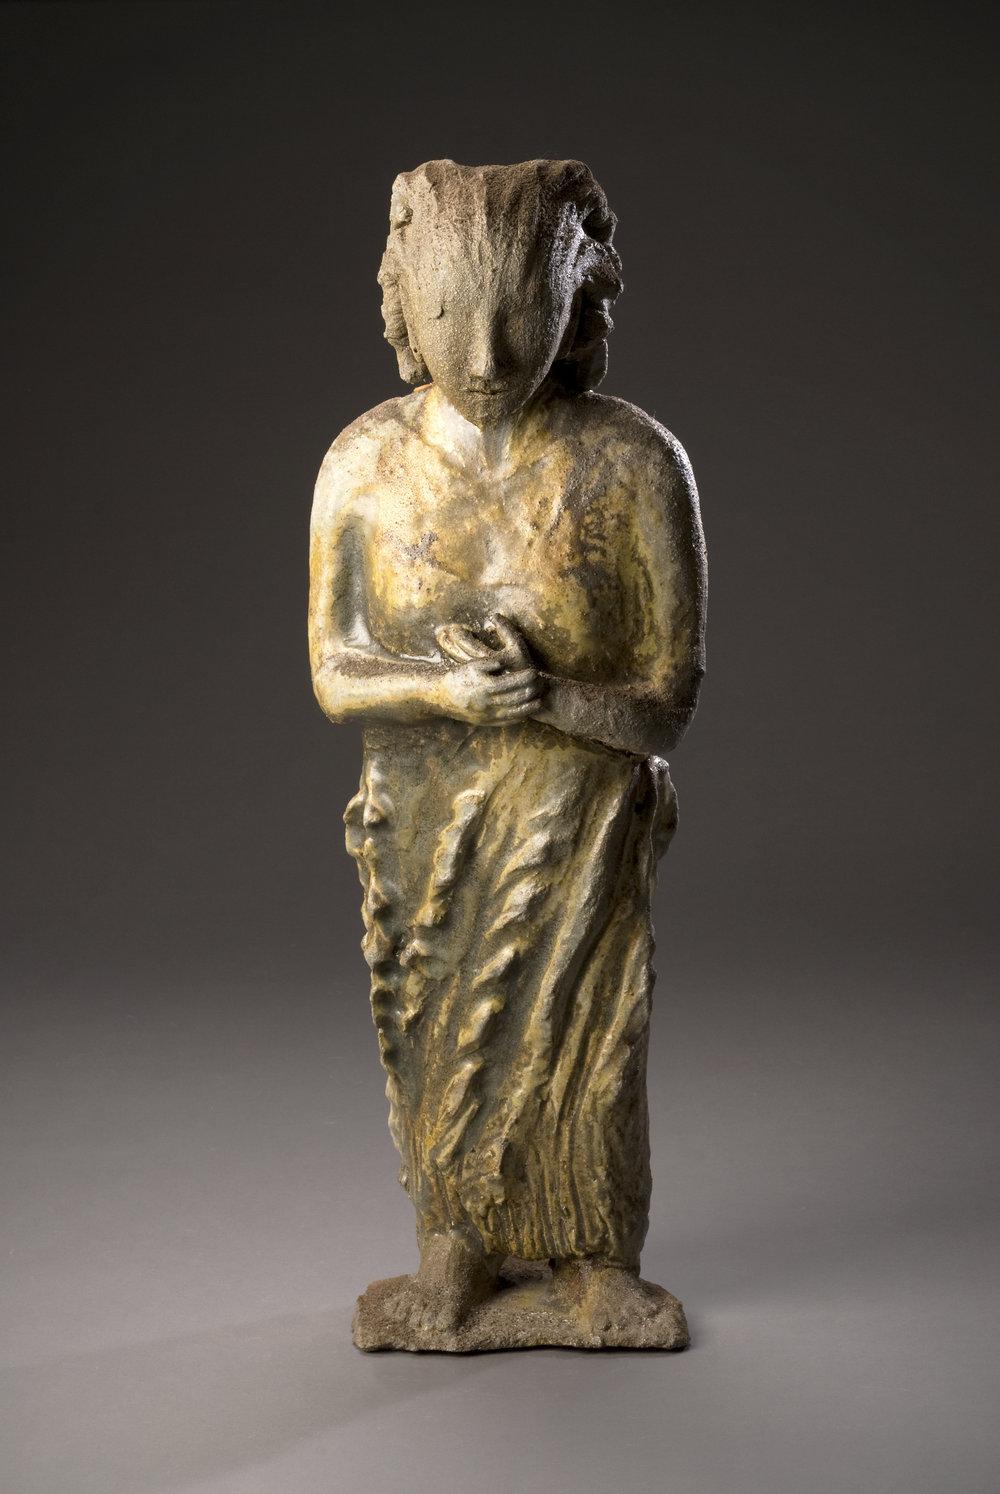 shrine figure - 3_4 view - wood-fired goldceladon -l  27%22x9%22x8%22@300.jpg